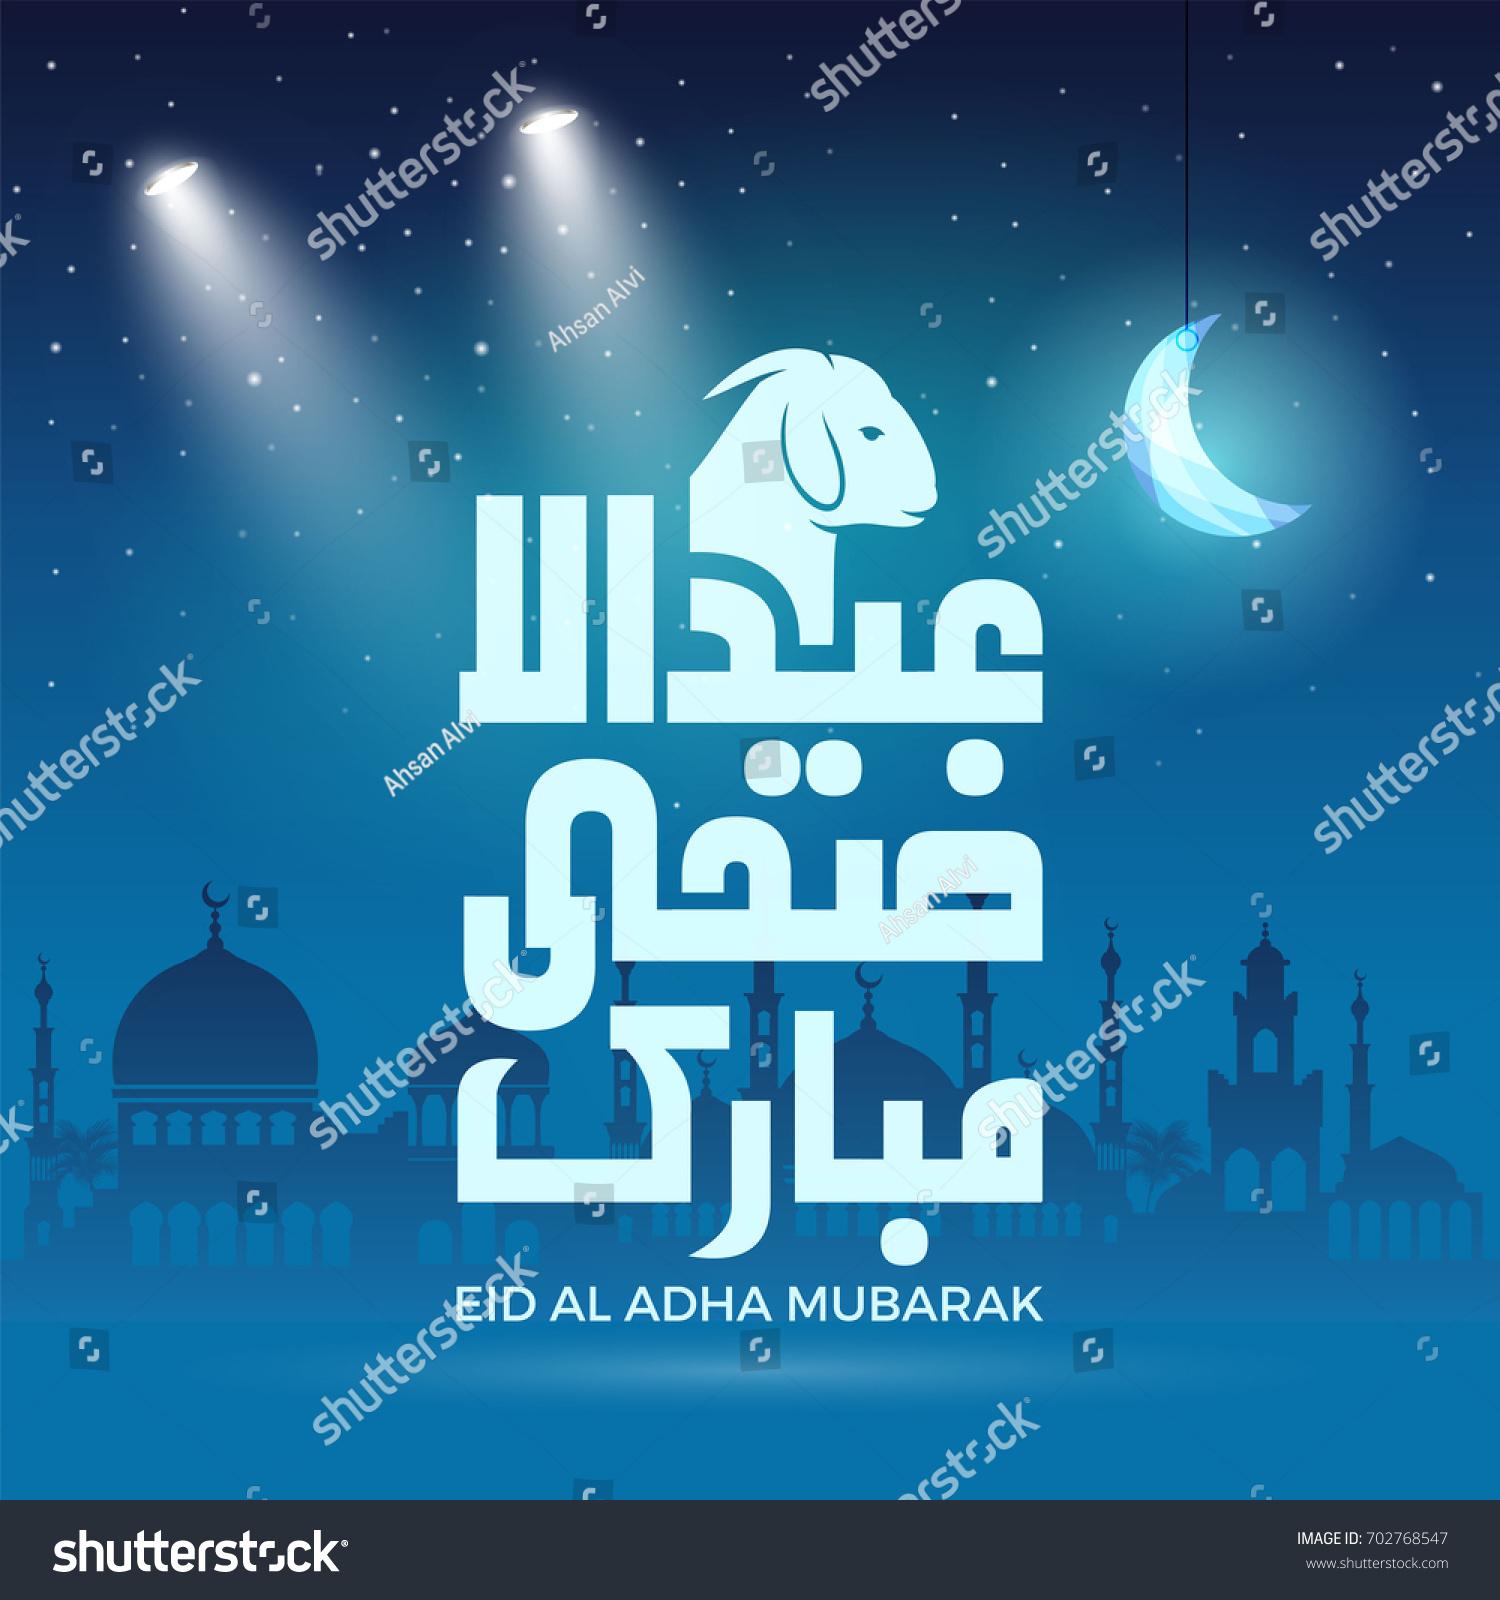 Eid Al Adha Mubarak Card Eid Stock Vector Royalty Free 702768547